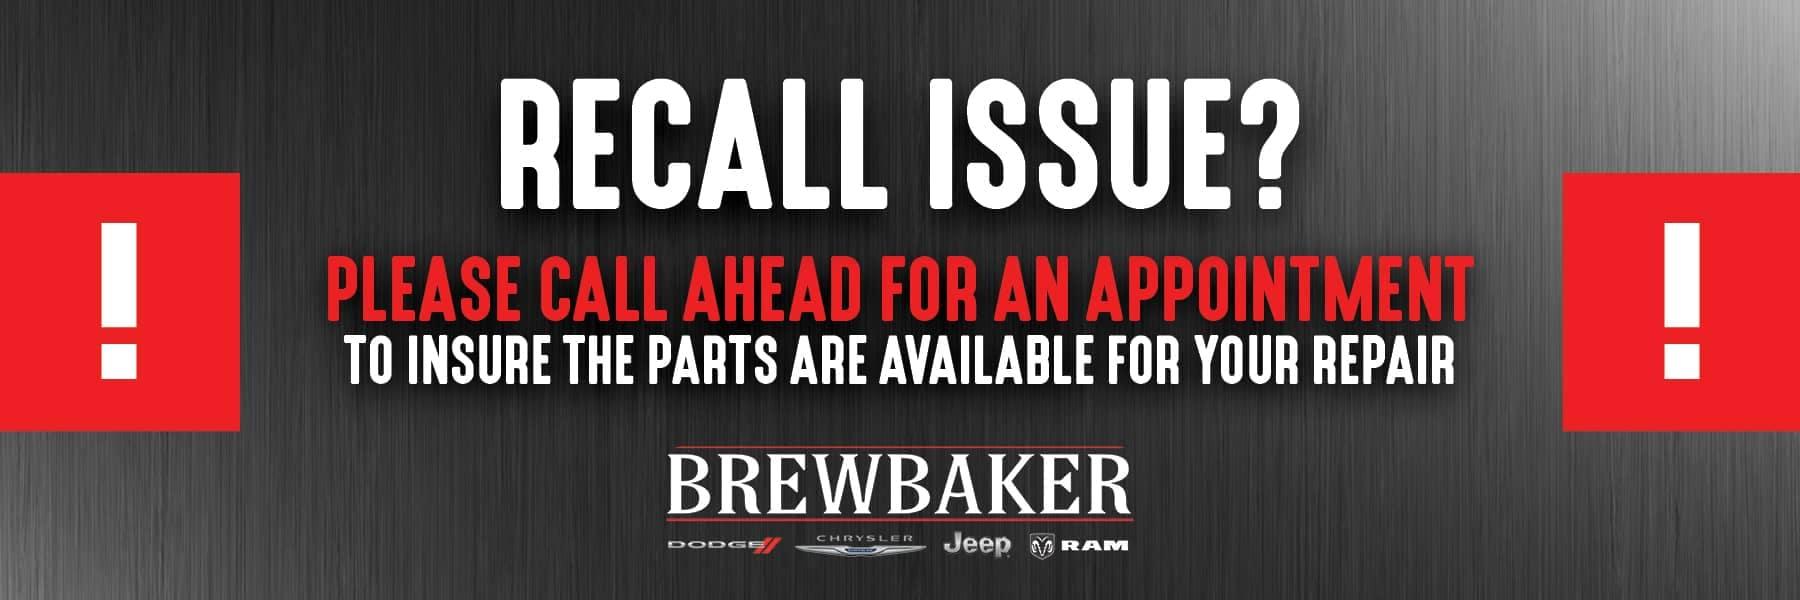 Brewbaker Recall